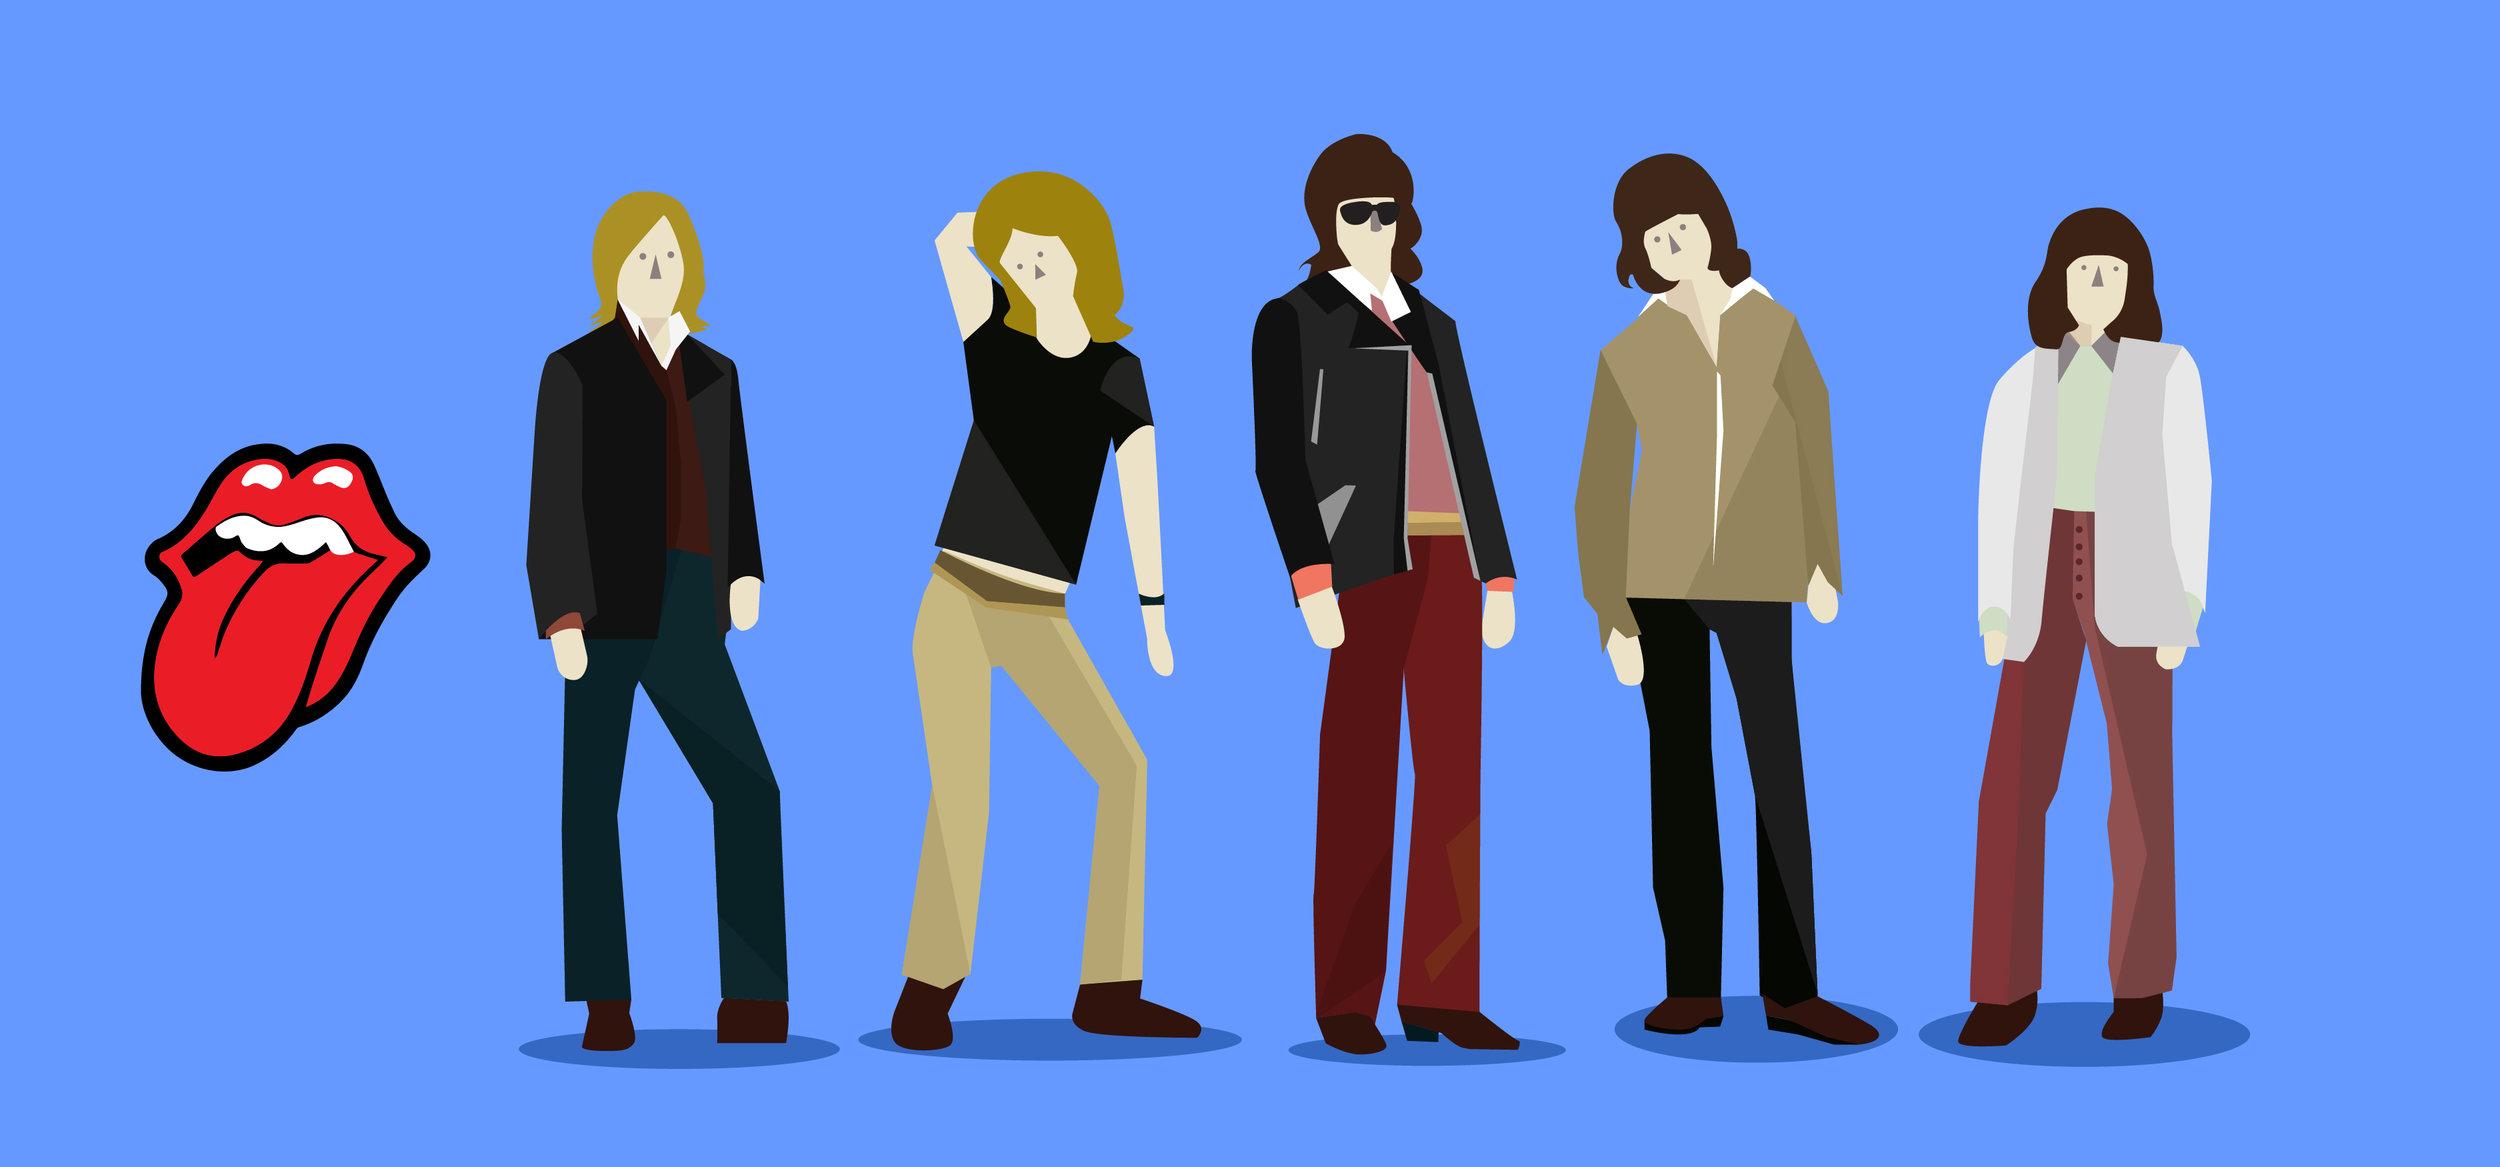 RockBand_01-03.jpg